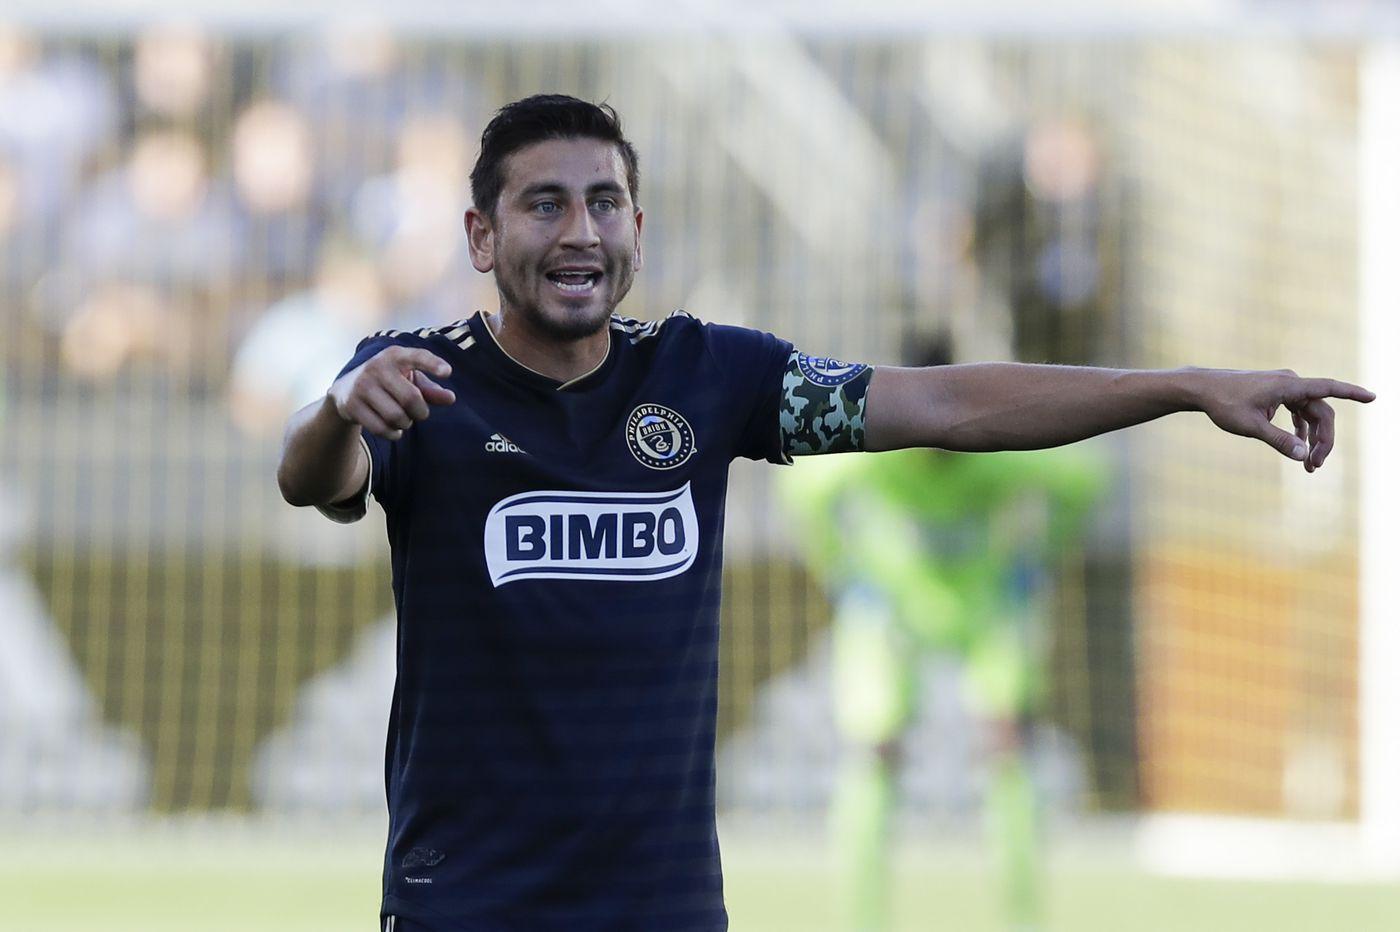 Union captain Alejandro Bedoya no longer a designated player